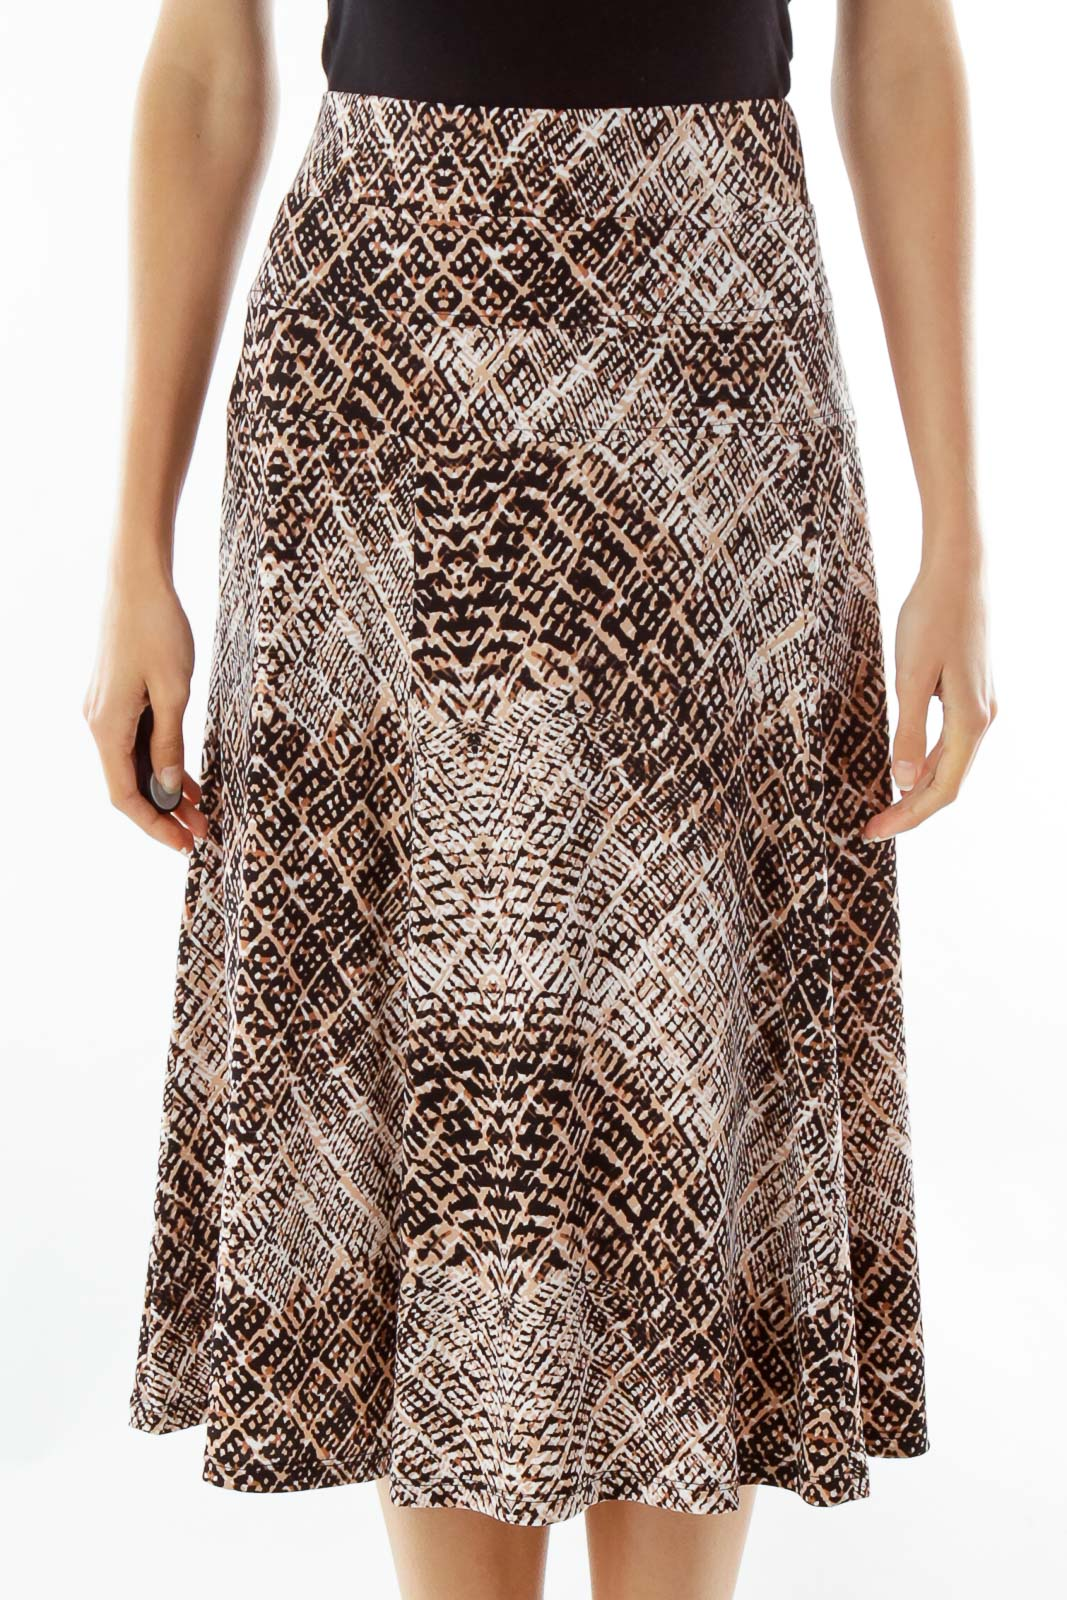 Black White Brown Print Maxi Skirt